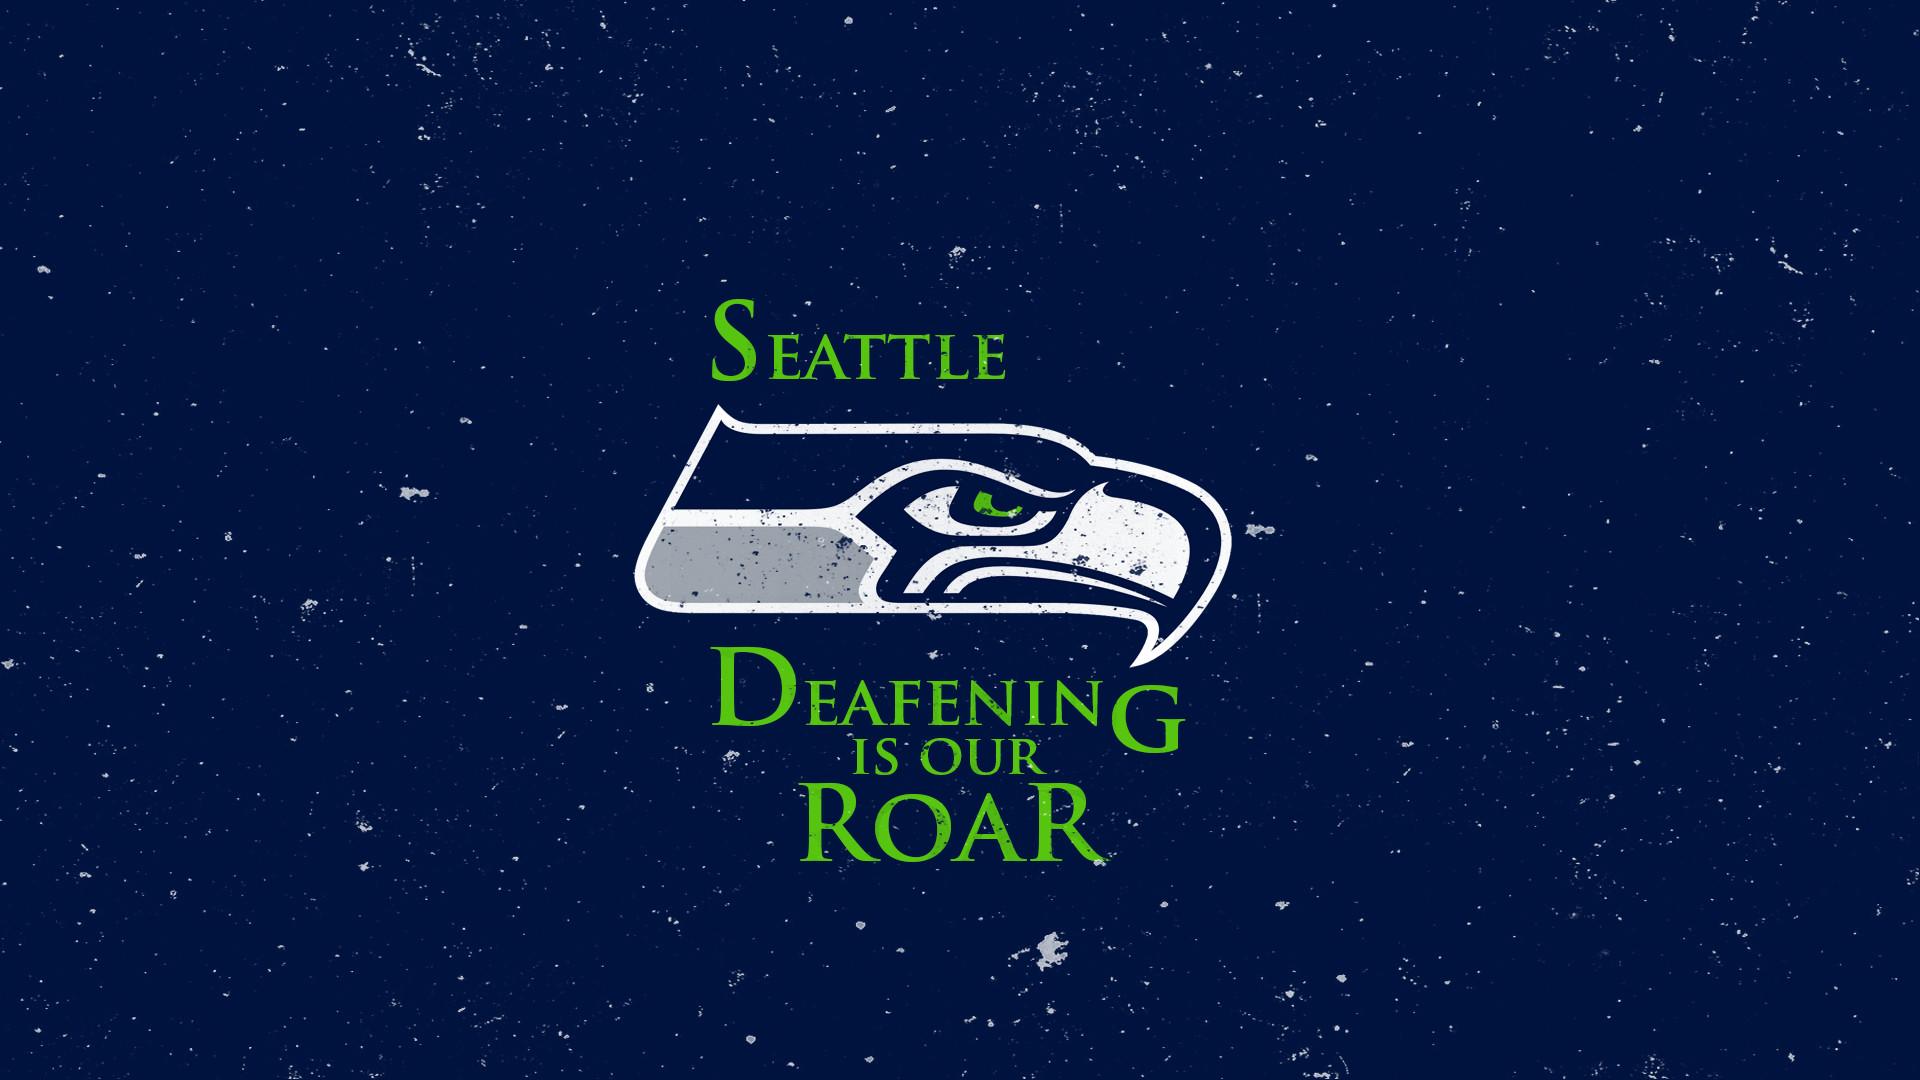 2013 Seattle Seahawks nfl football hj wallpaper background